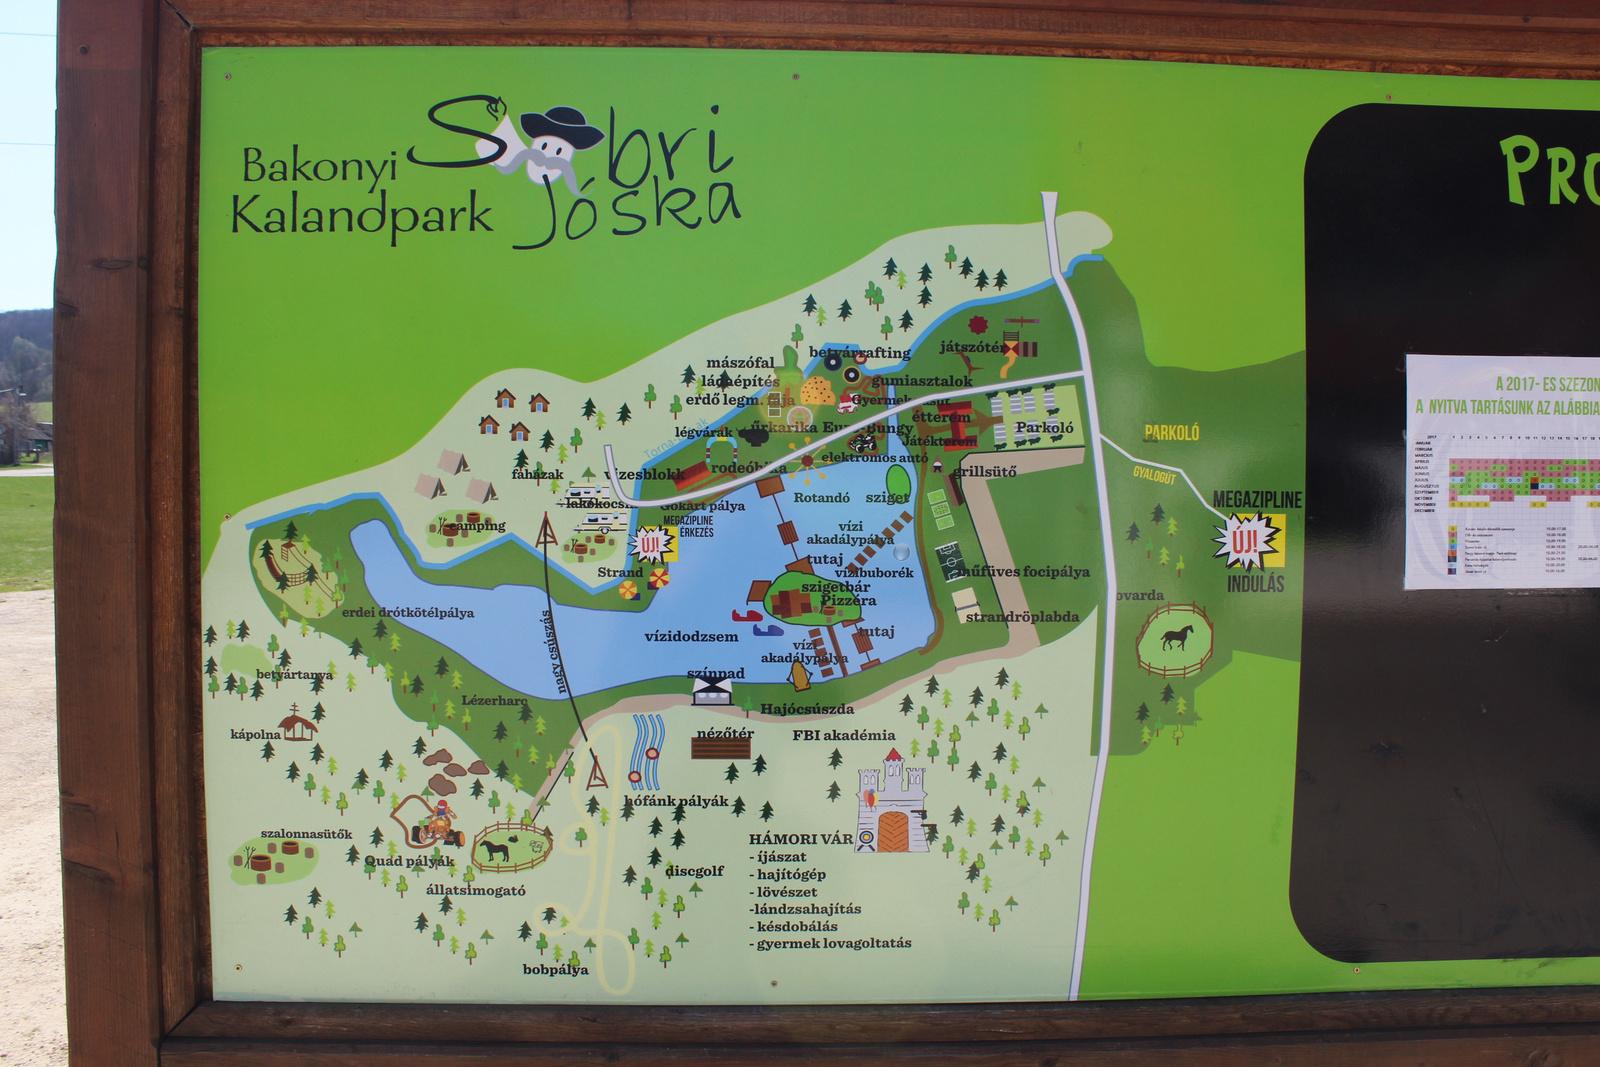 20170402-50-SobriJoskaKalandpark